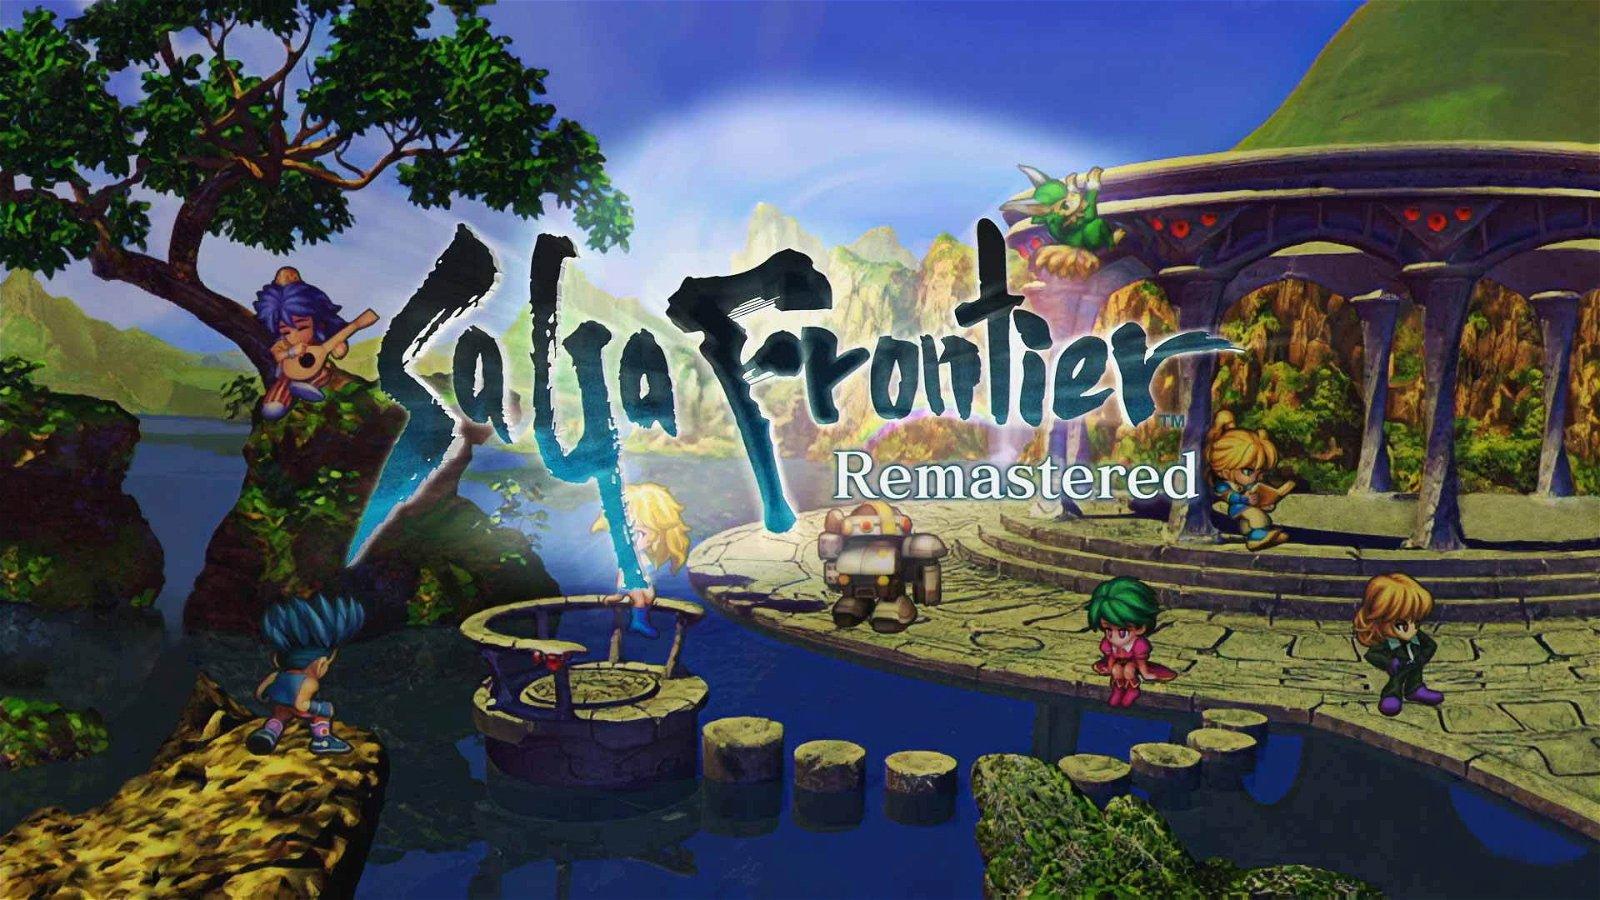 Revisit a Hidden Gem With SaGa Frontier Remastered